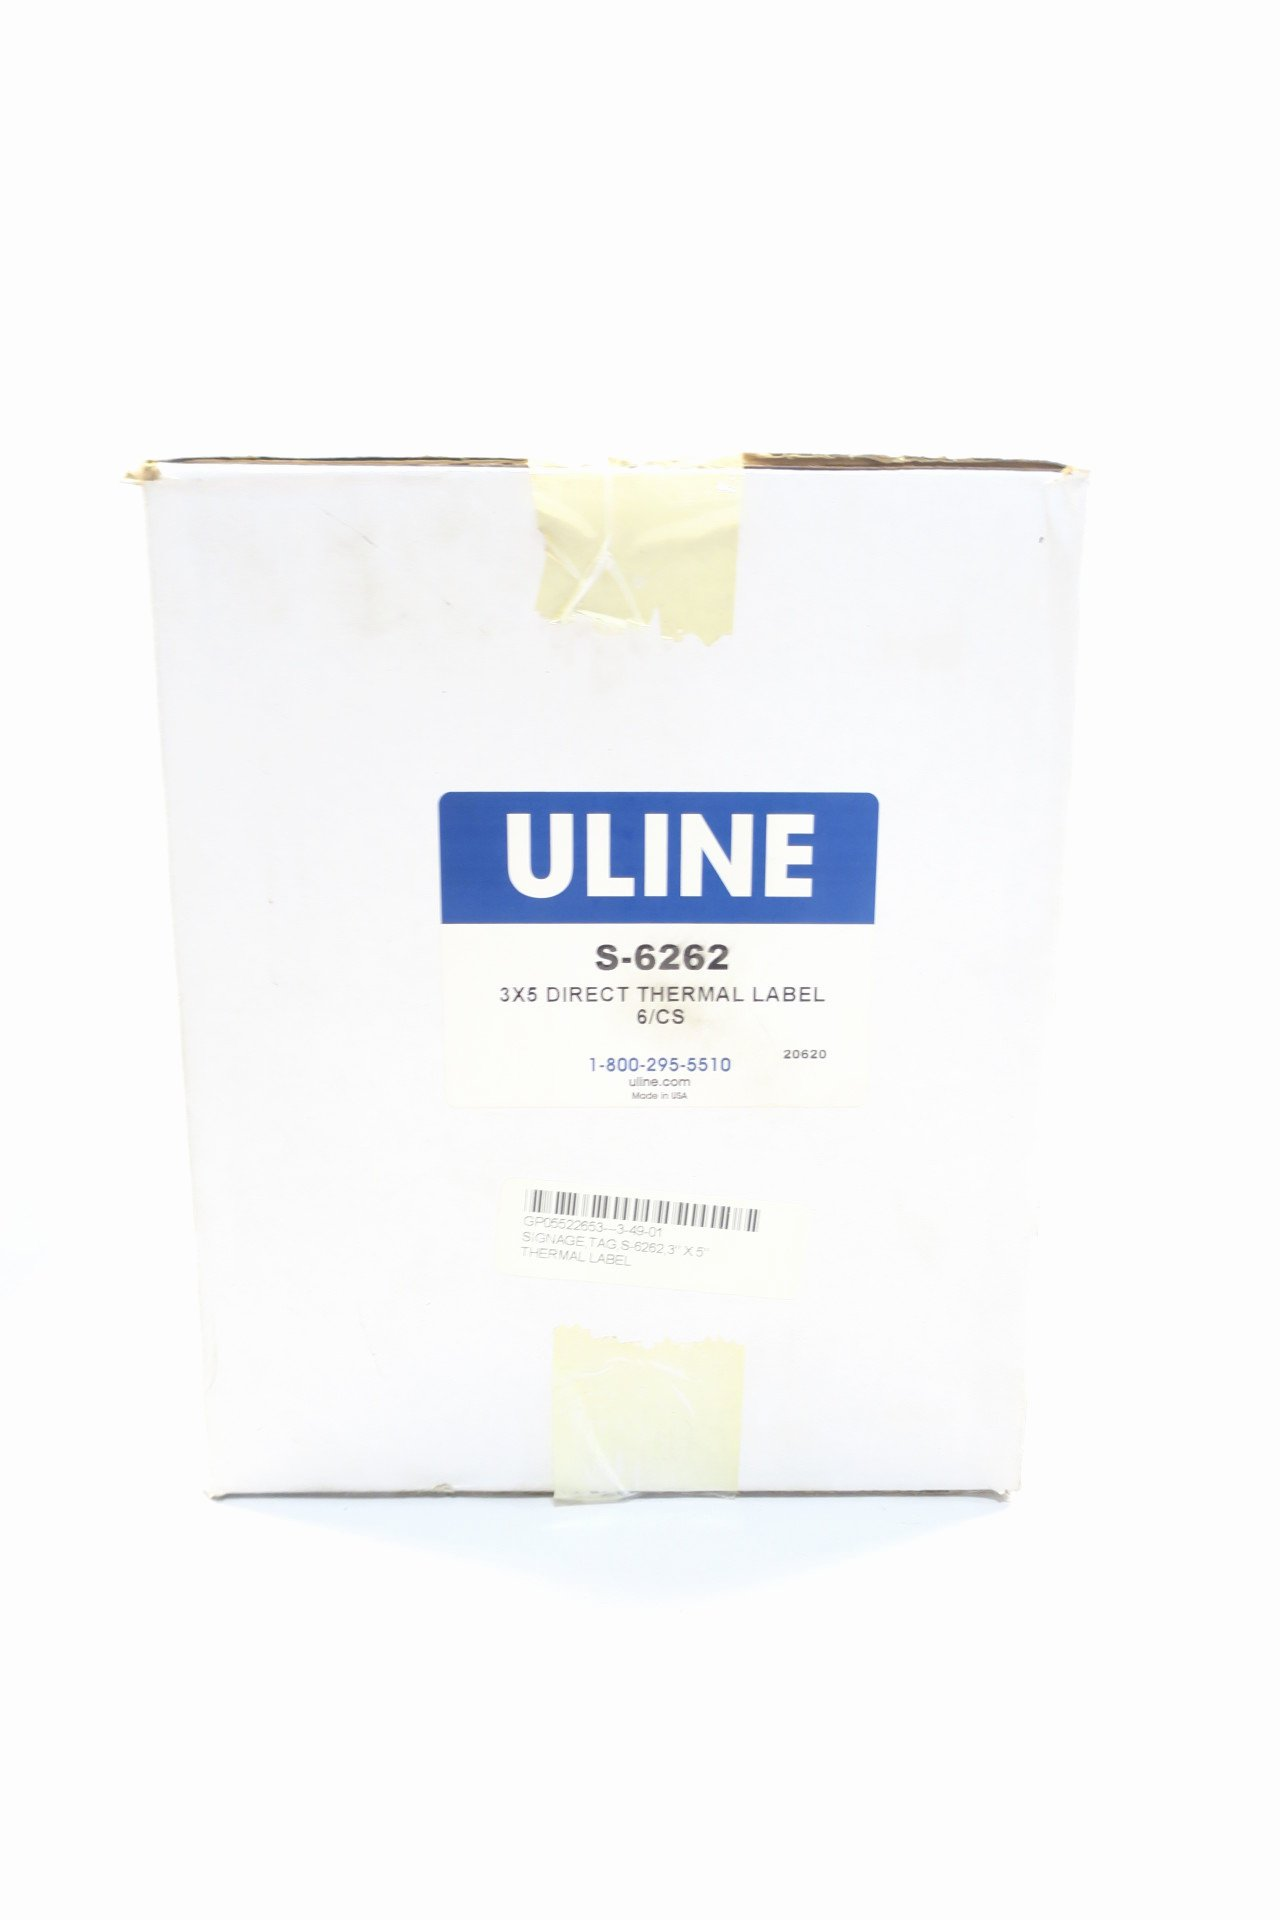 Uline Label Printer Inspirational Box Of 6 Uline S 6262 3x5 Direct thermal Label D